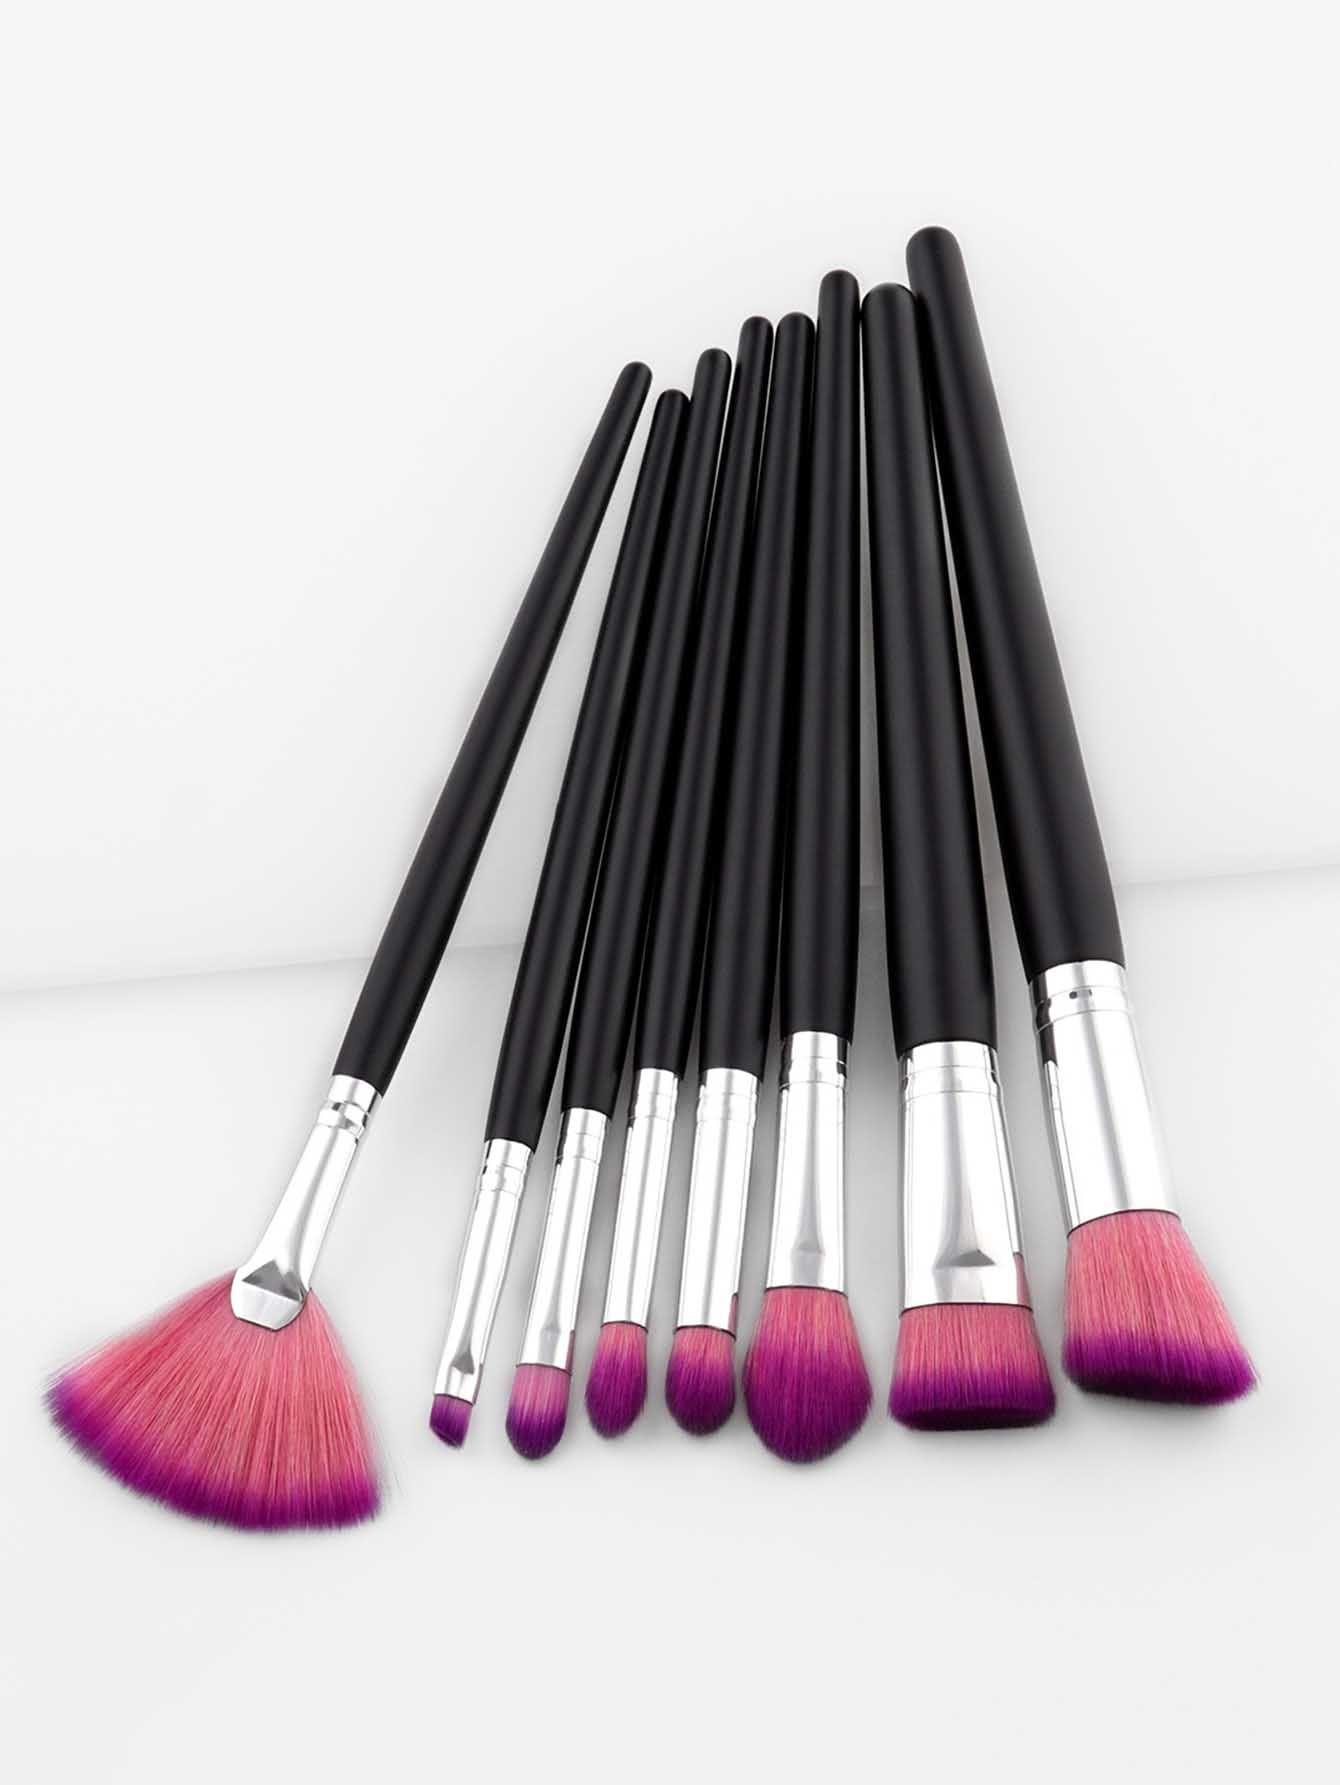 Buy Makeup Brushes Set Online